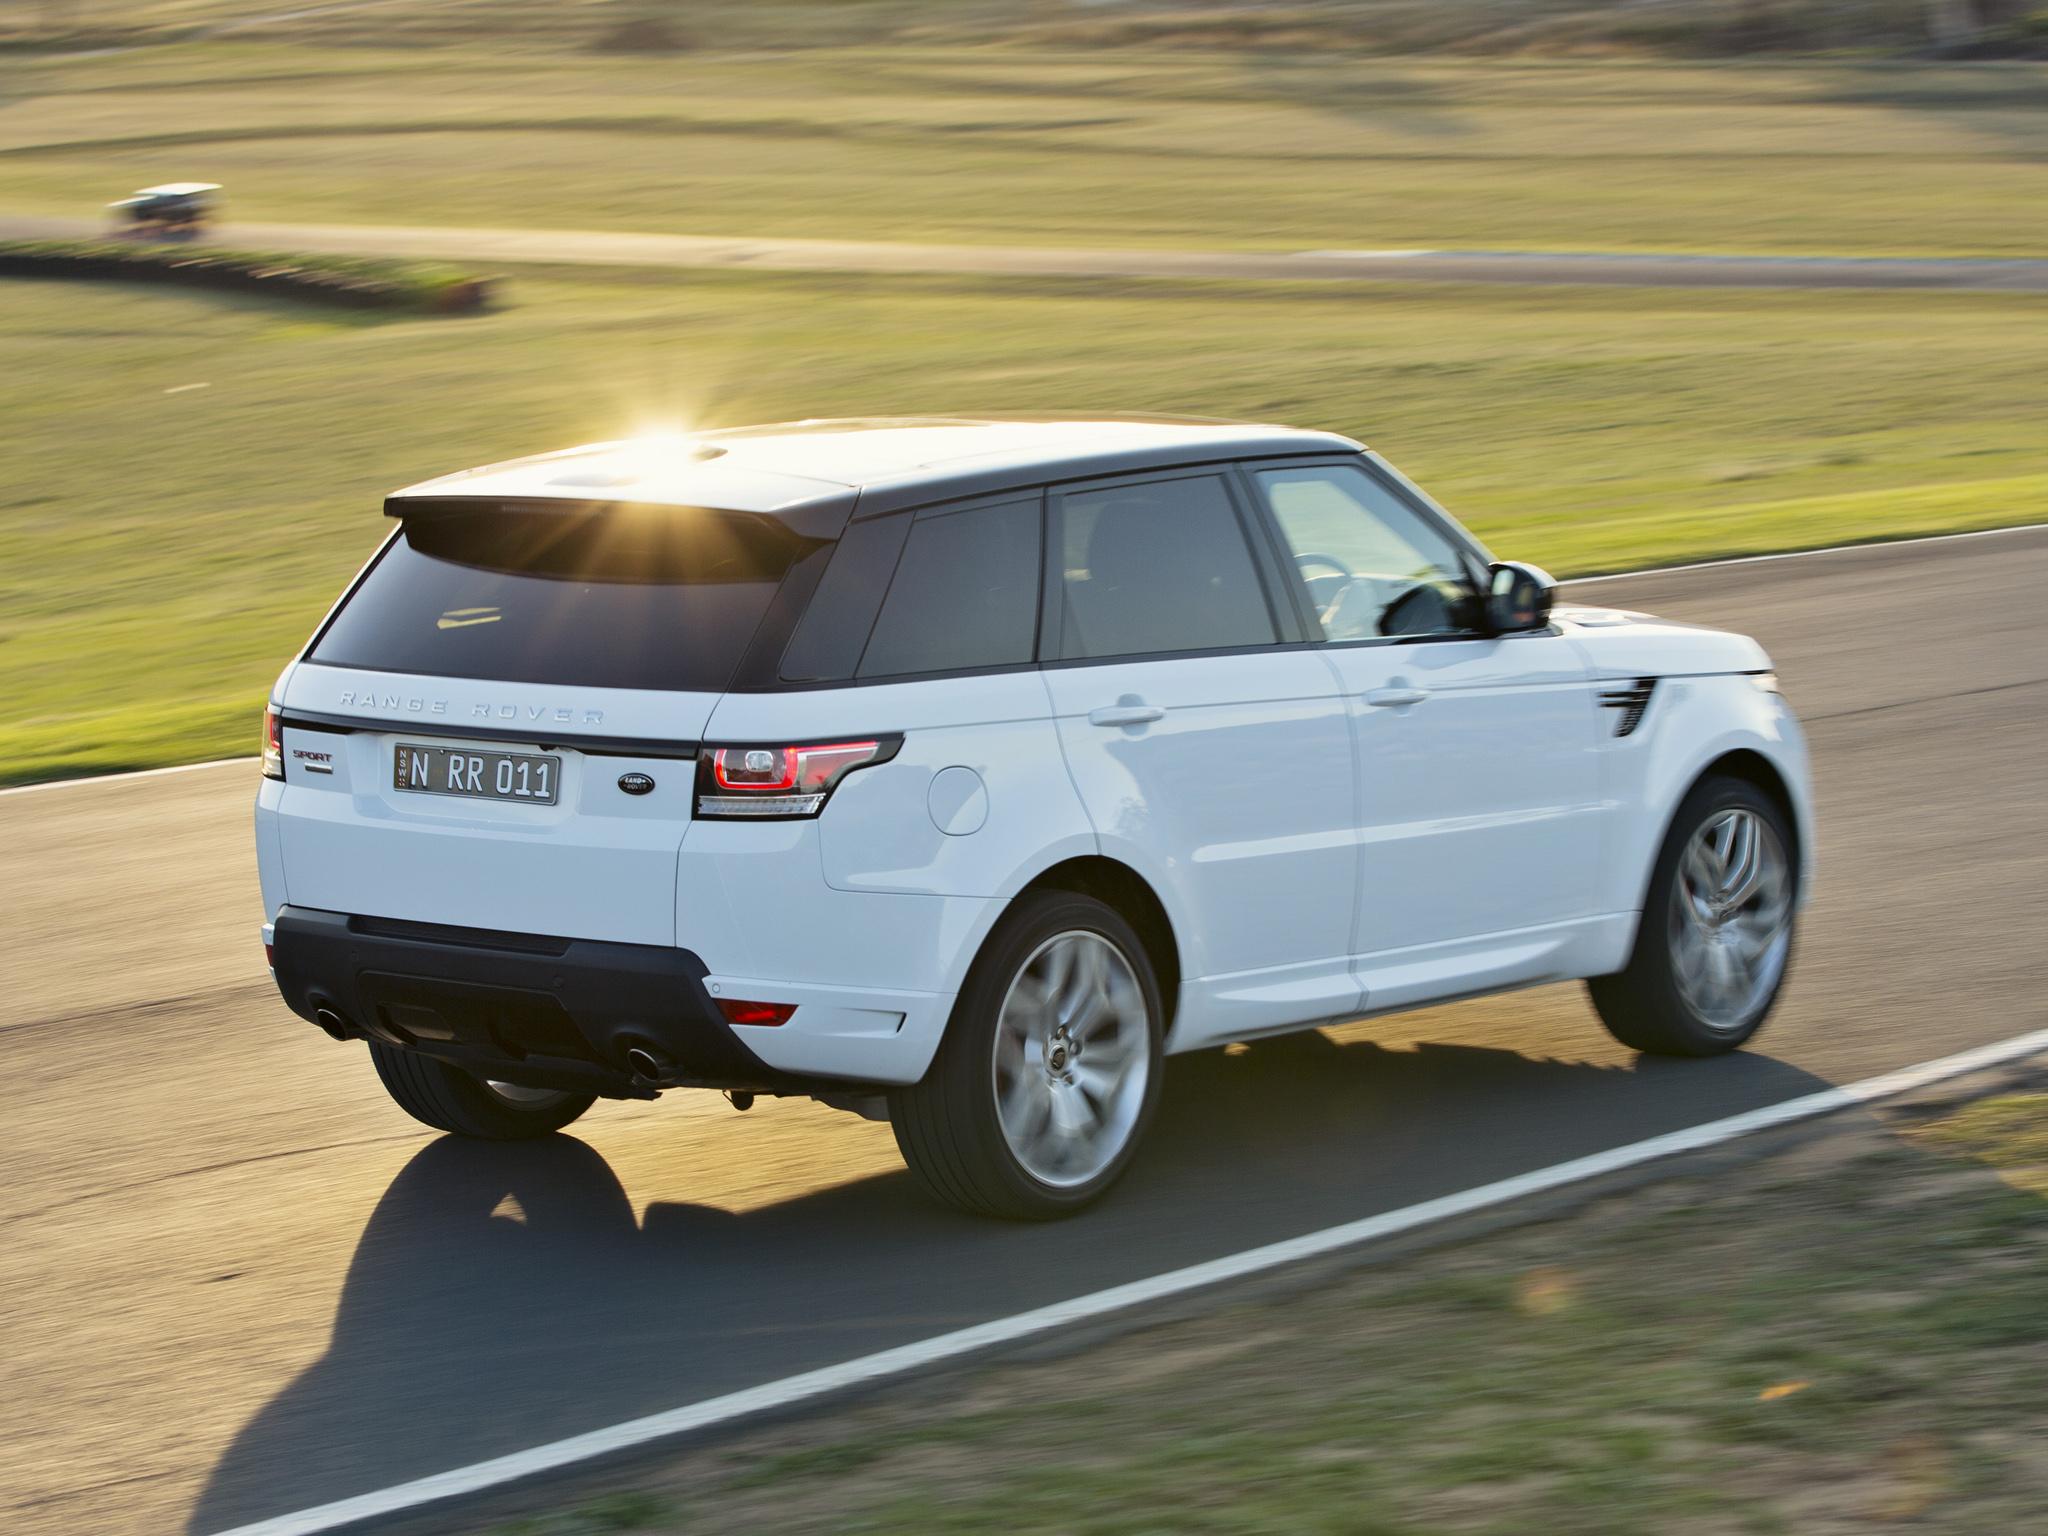 Range Rover Sport 2014 >> 2014 Range Rover Sport Autobiography AU-spec suv awd luxury d wallpaper | 2048x1536 | 171149 ...